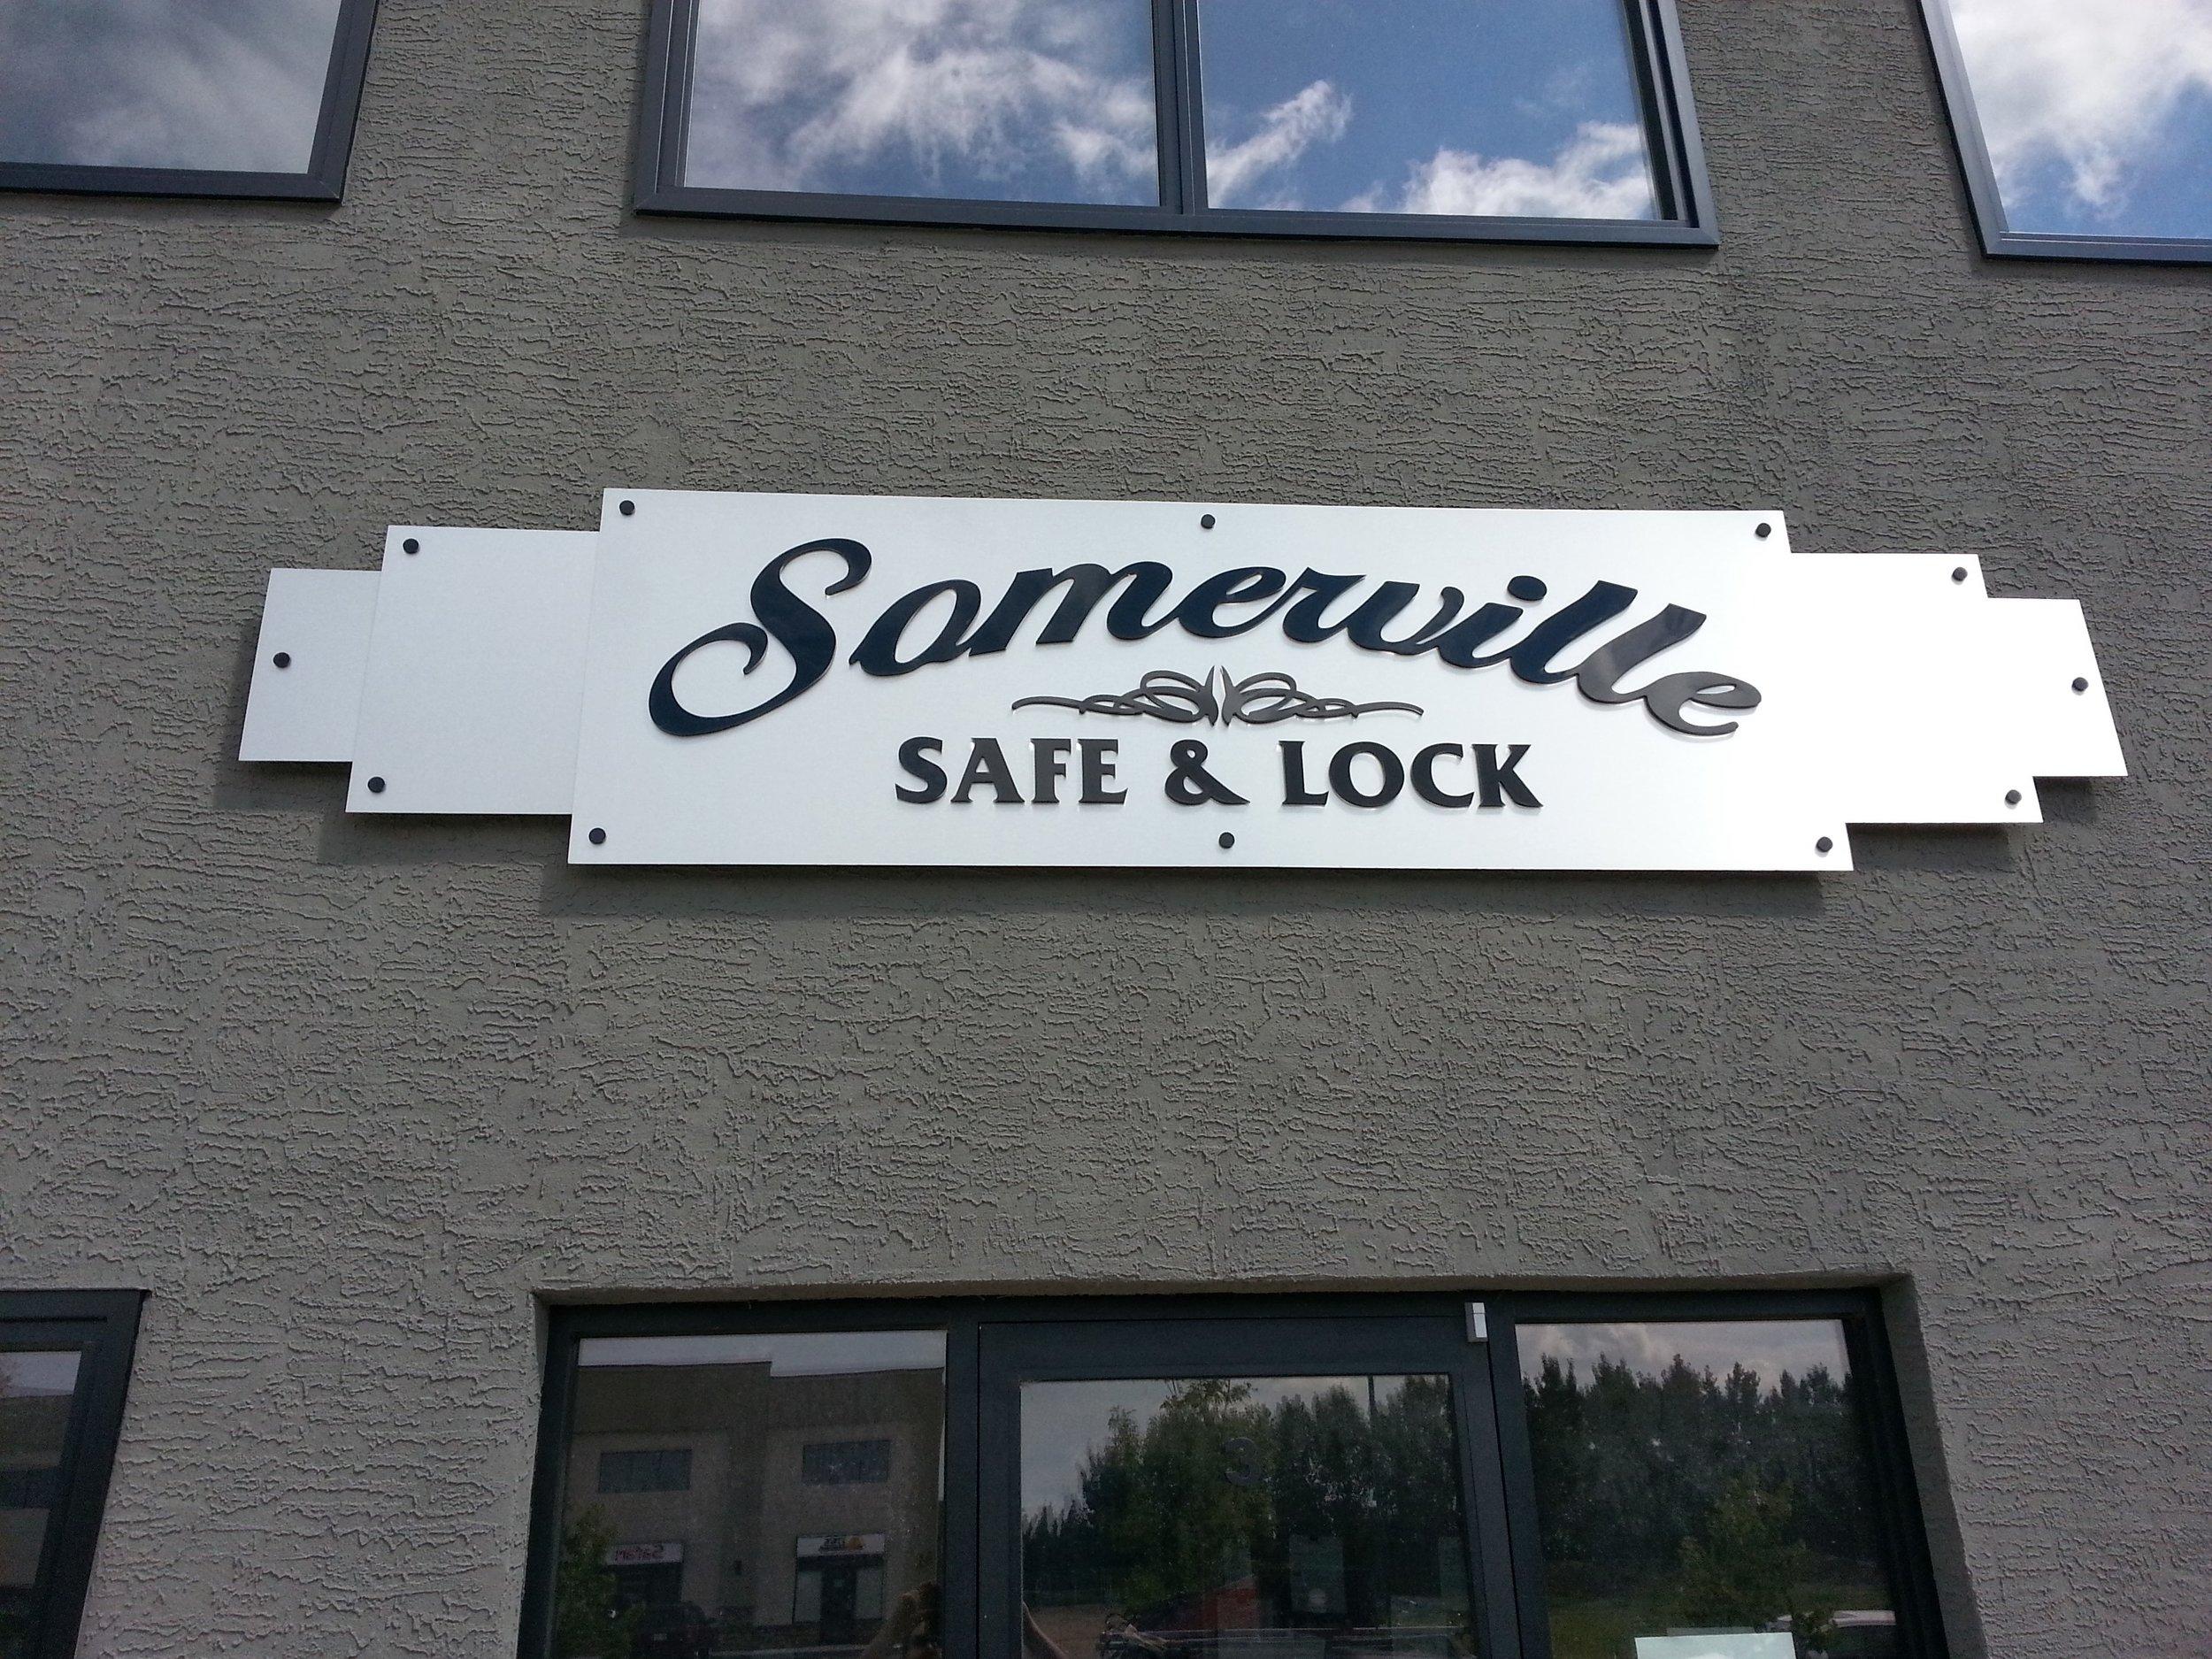 Somerville Safe & Lock